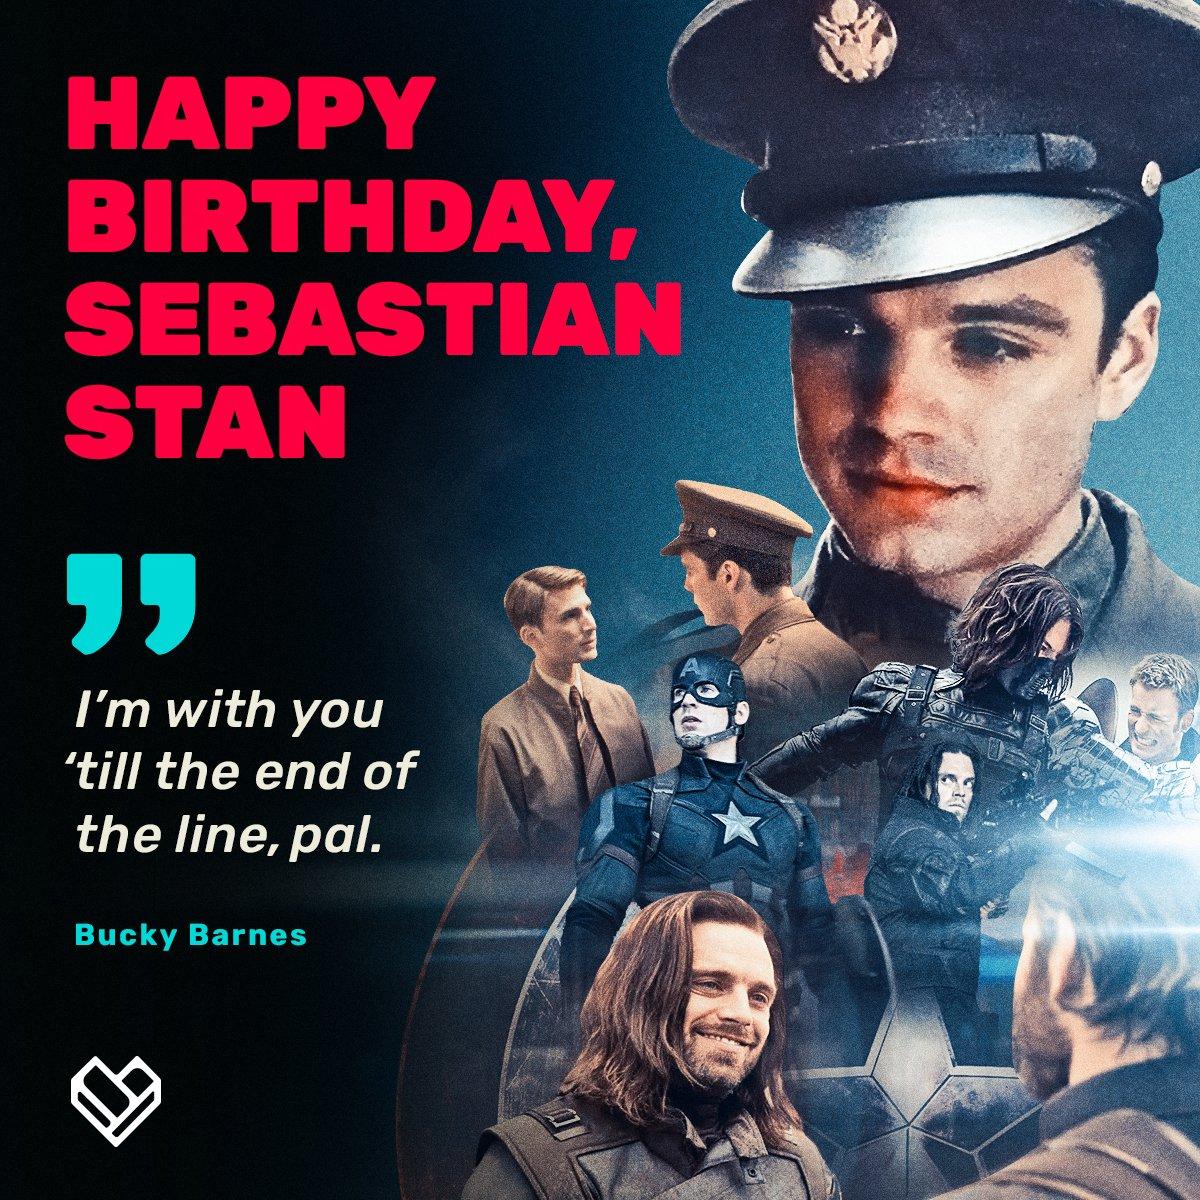 Happy Birthday Sebastian Stan A.K.A the ultimate BFF